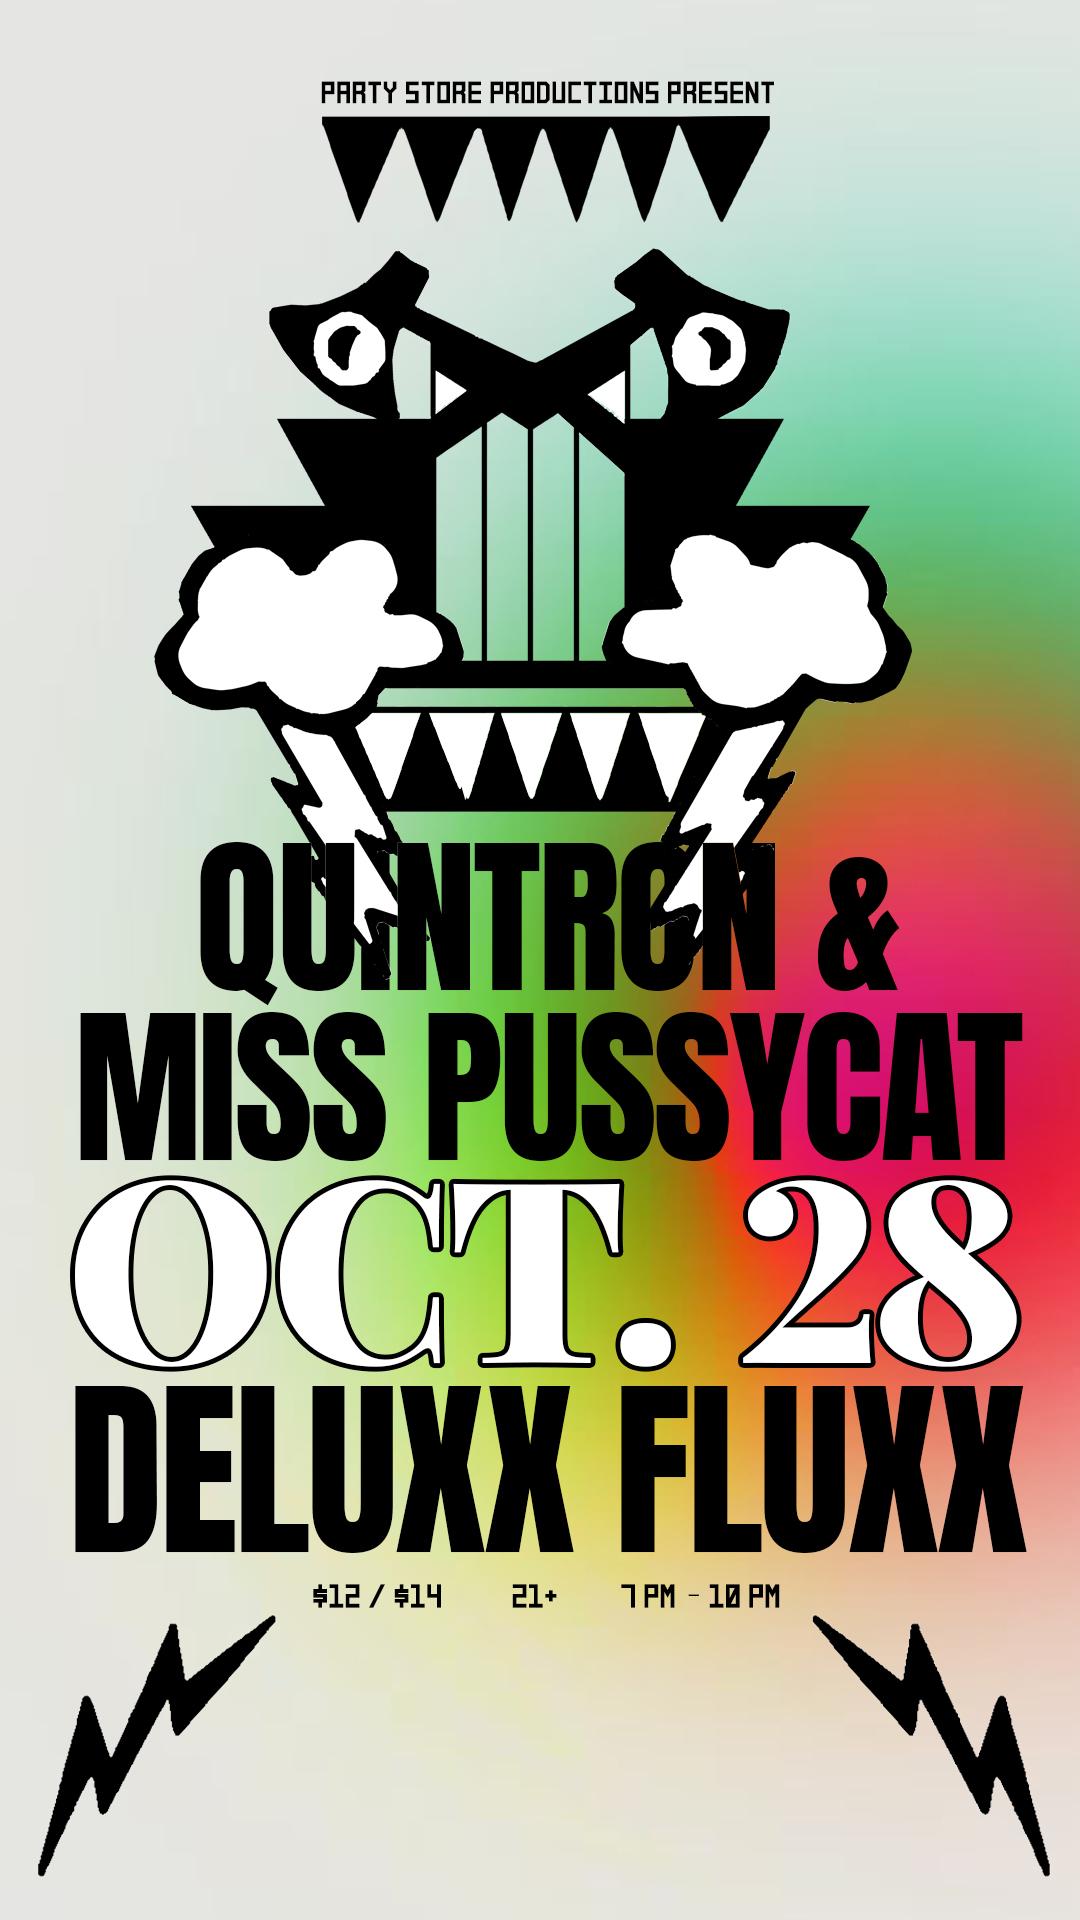 QuintronMissPussycat.jpg